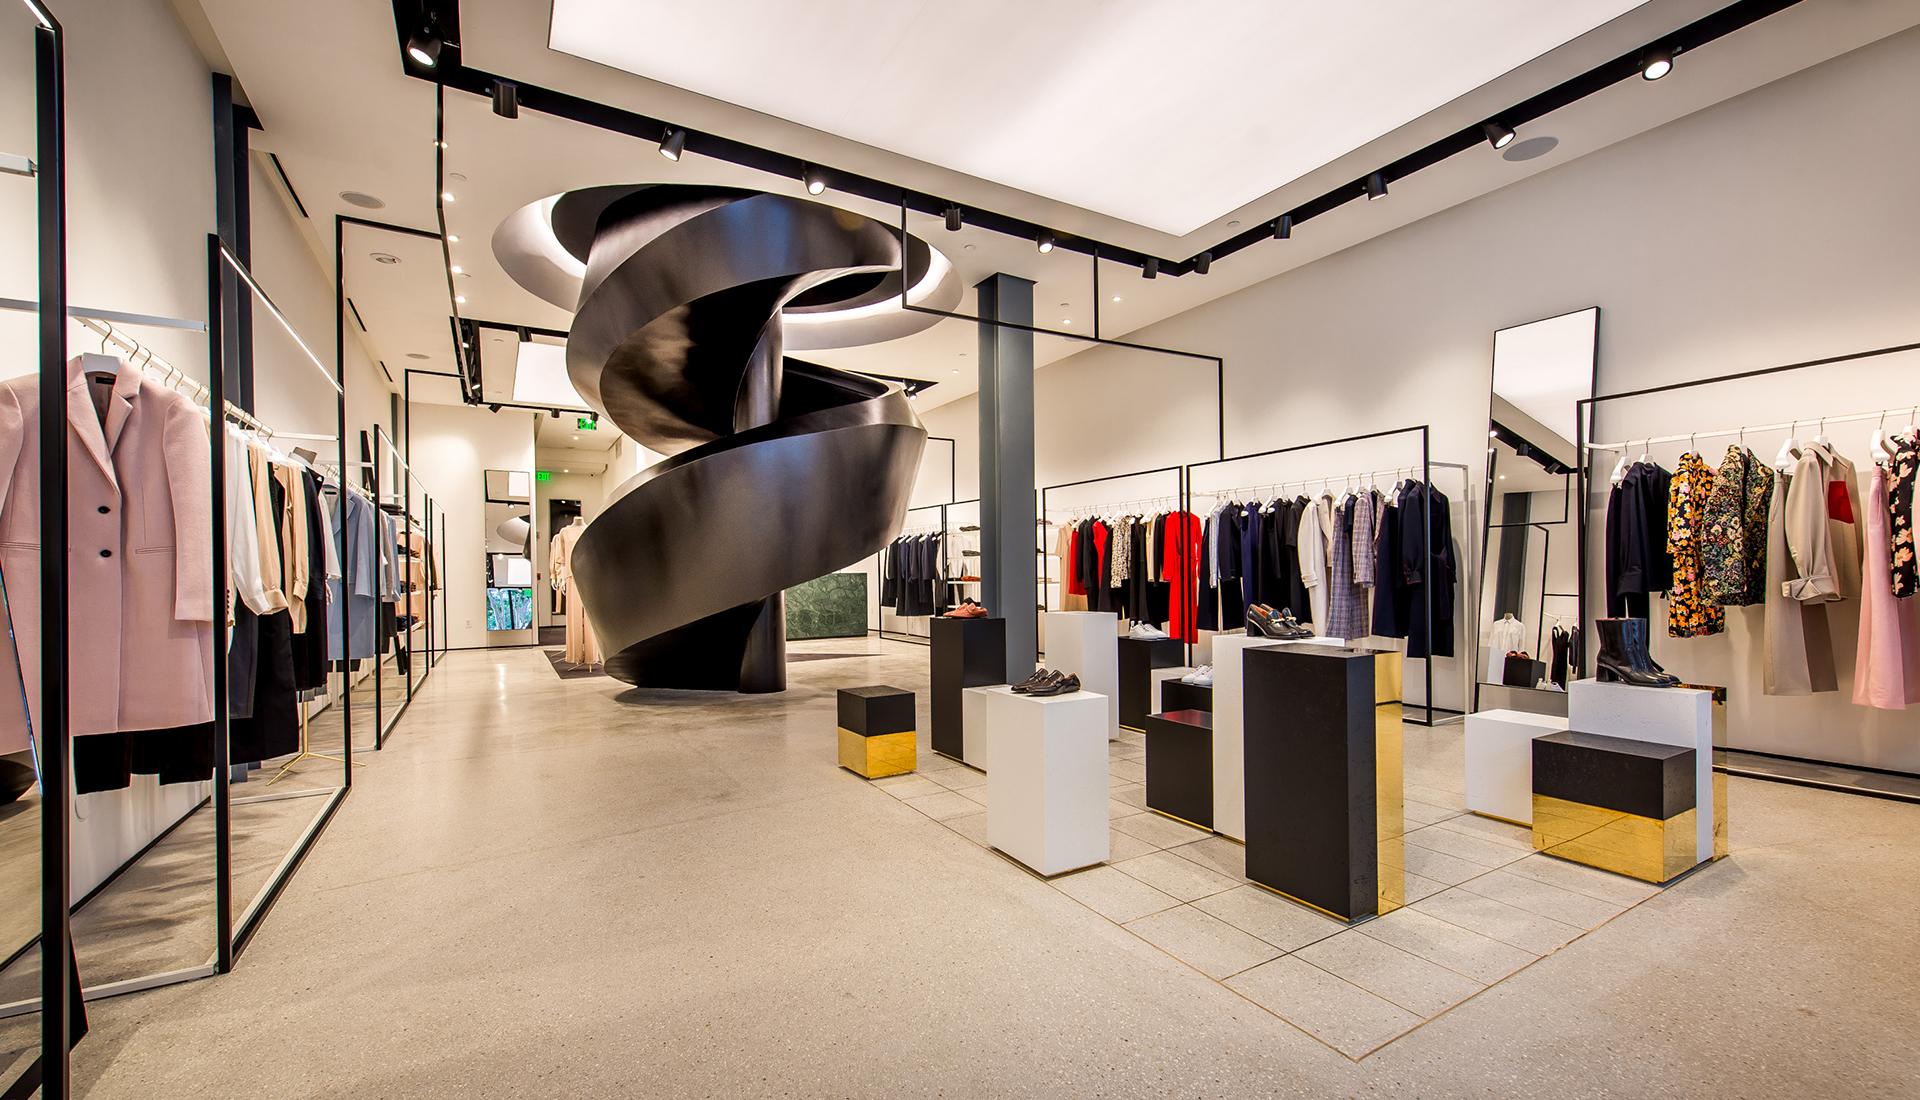 Sybarite studio: бутик Joseph со скульптурной лестницей